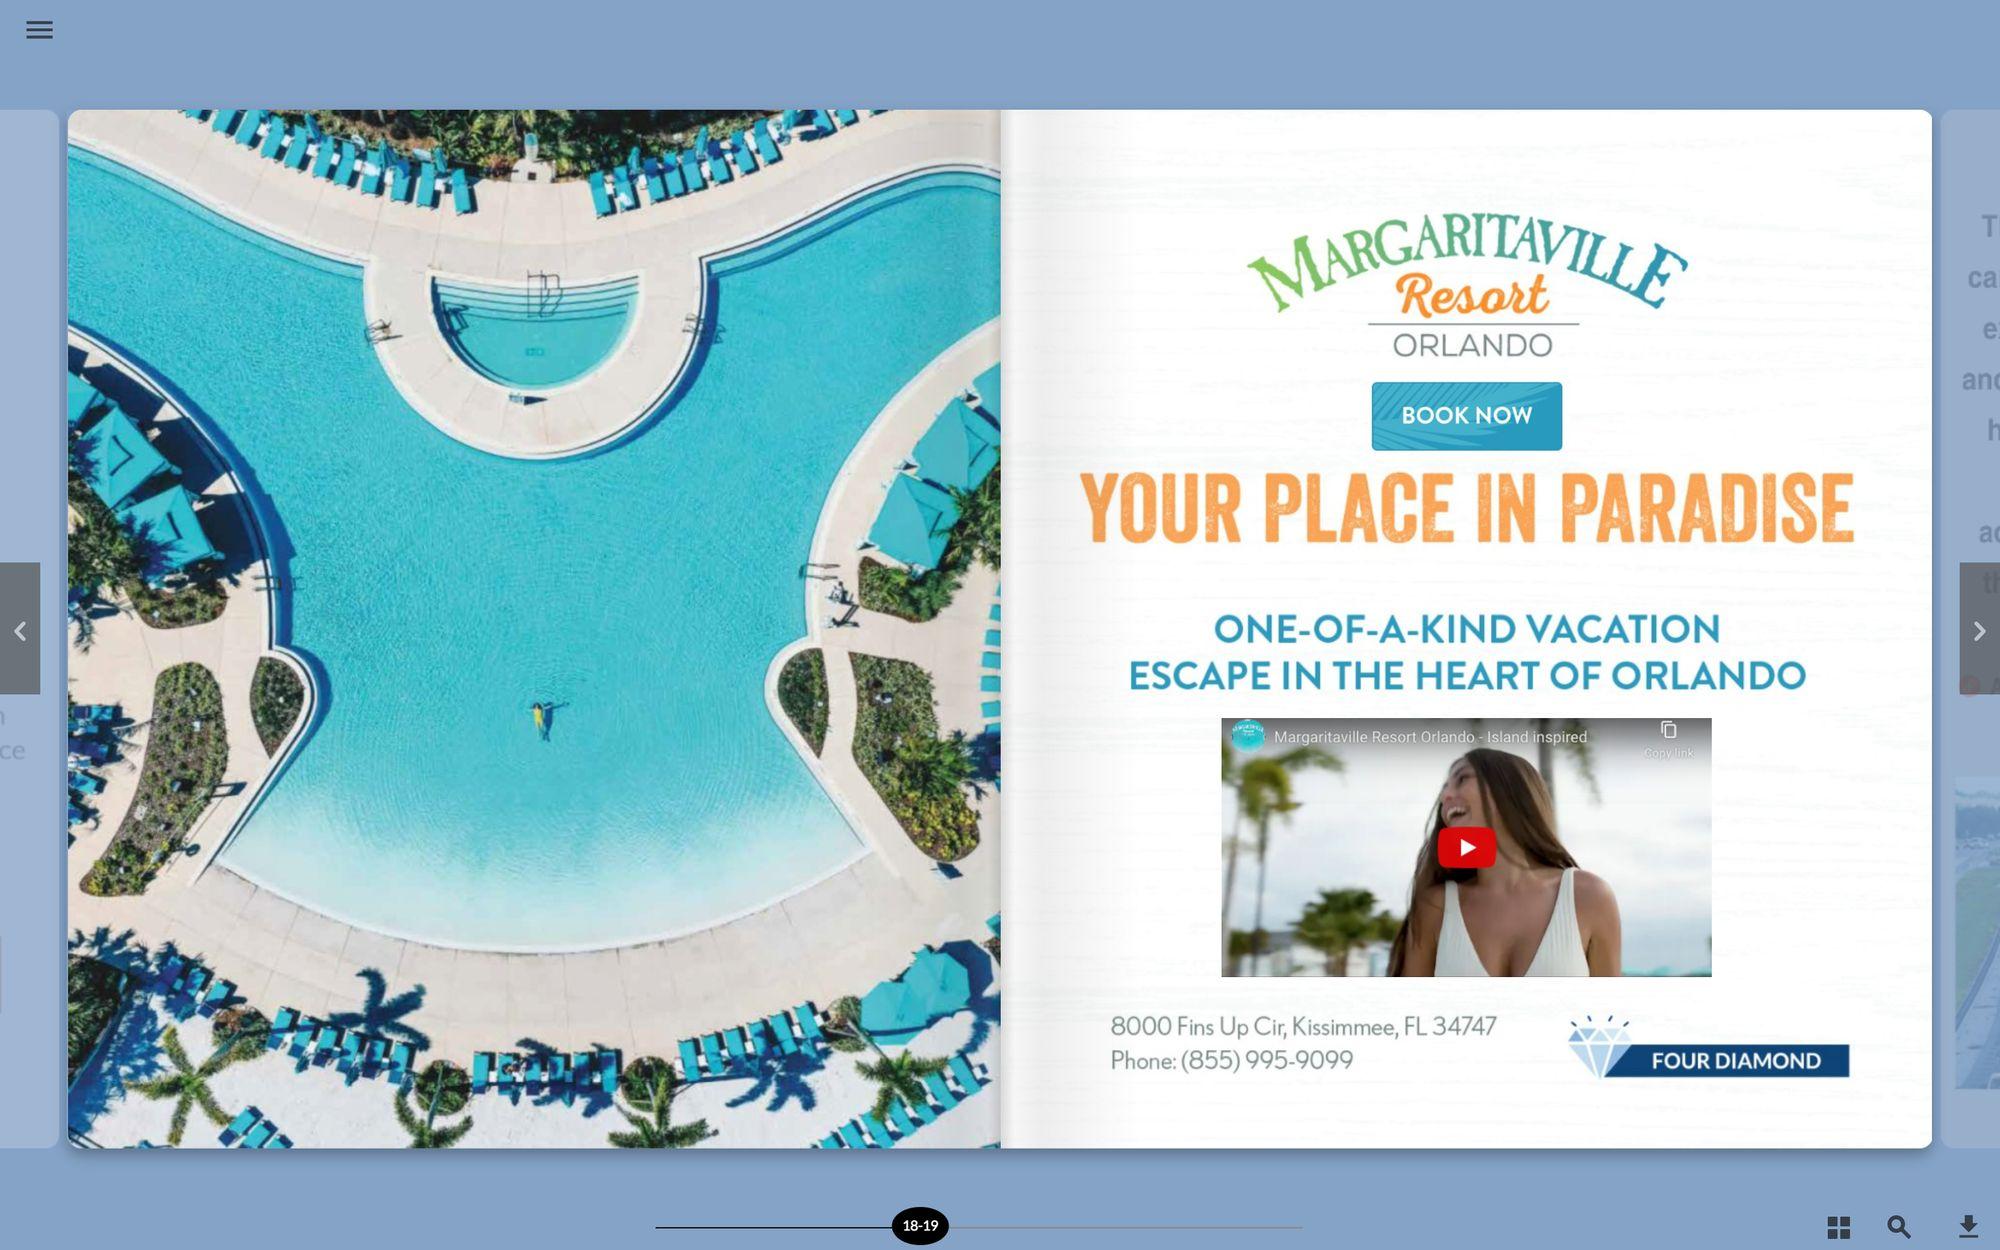 Margaritaville Ad on a Digital Tourbook